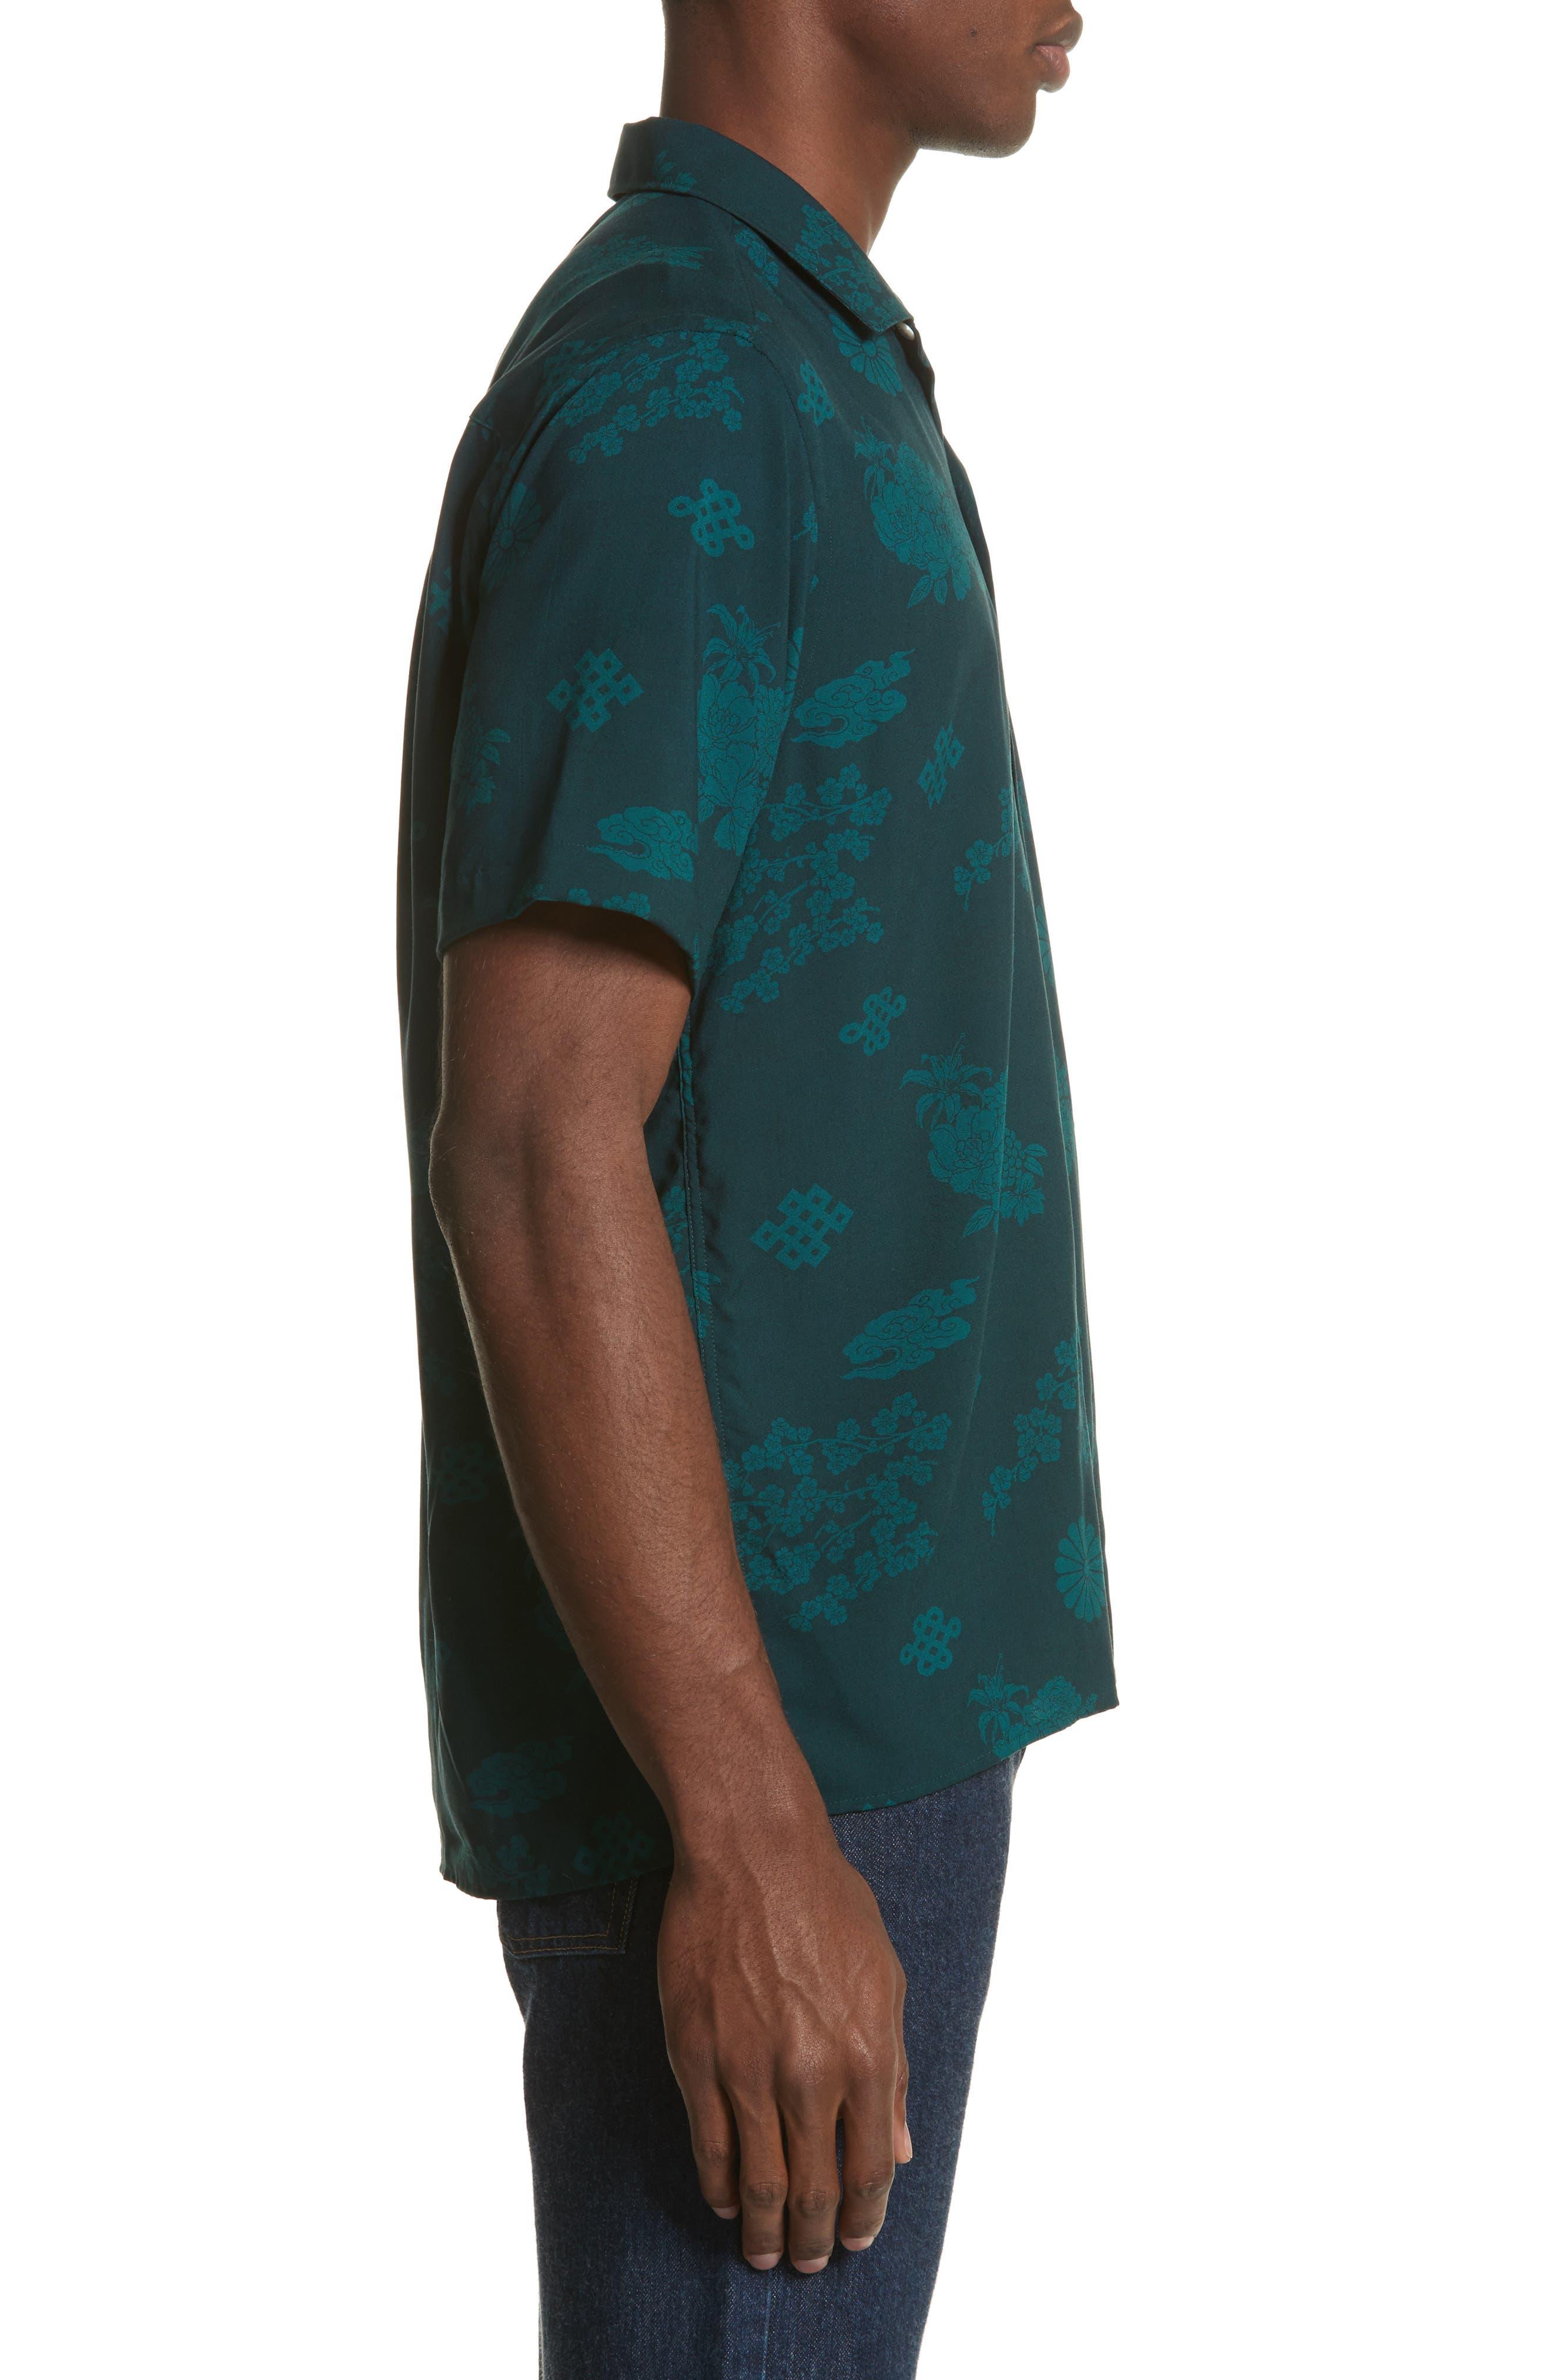 x The North Face Men's Floral Print Camp Shirt,                             Alternate thumbnail 4, color,                             300